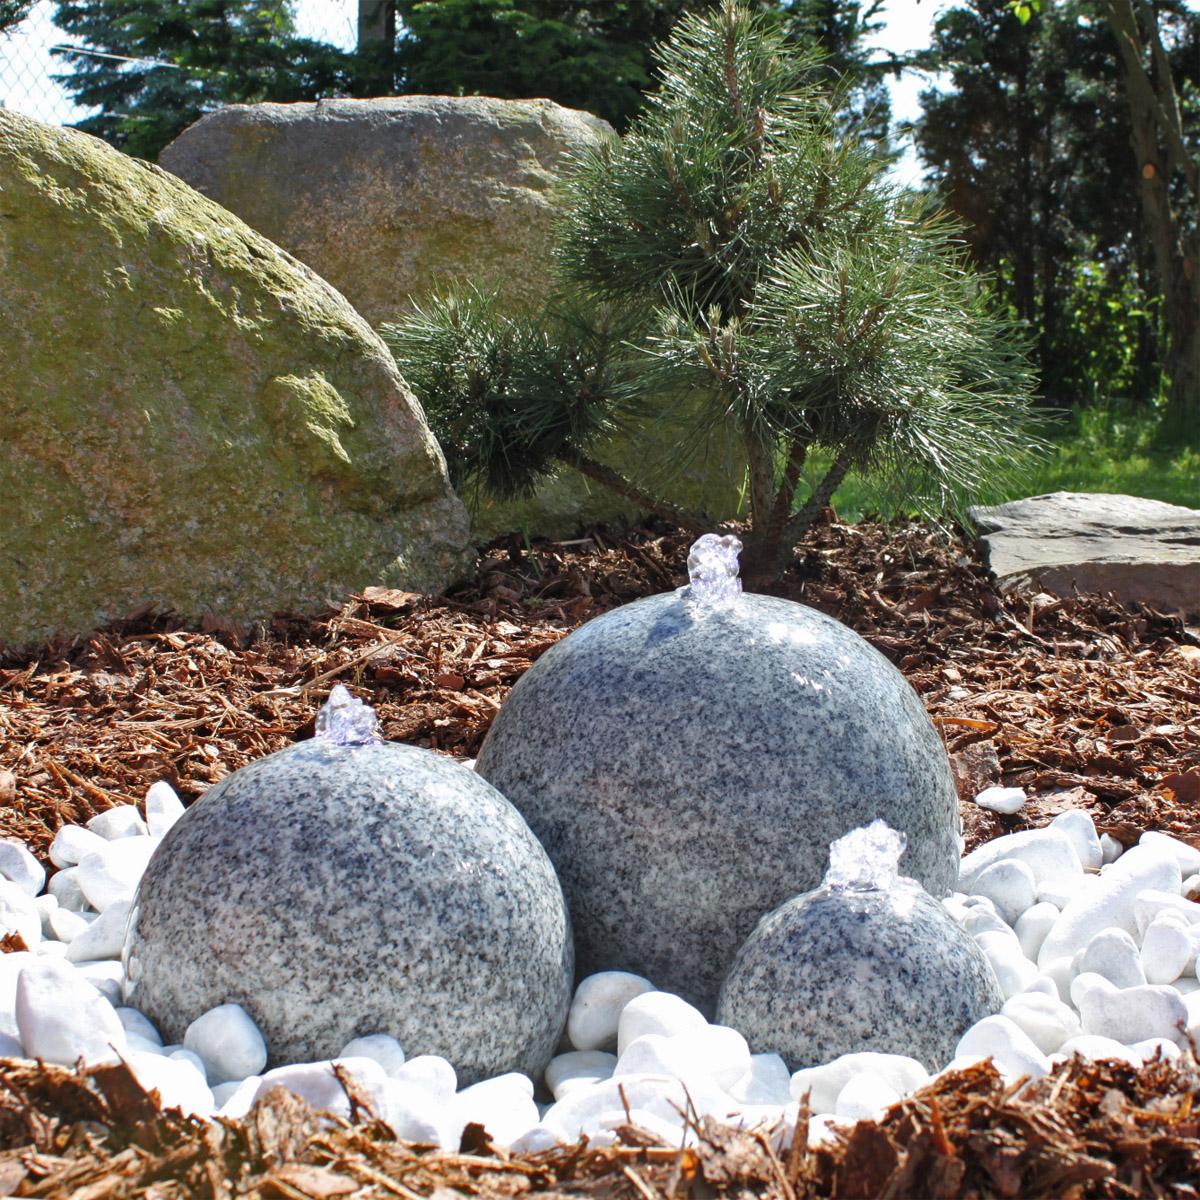 Galerie Fur Springbrunnen Garten Granit. Gartenbrunnen Granit: Garten U0026  Terrasse   Ebay, Best Garten Ideen